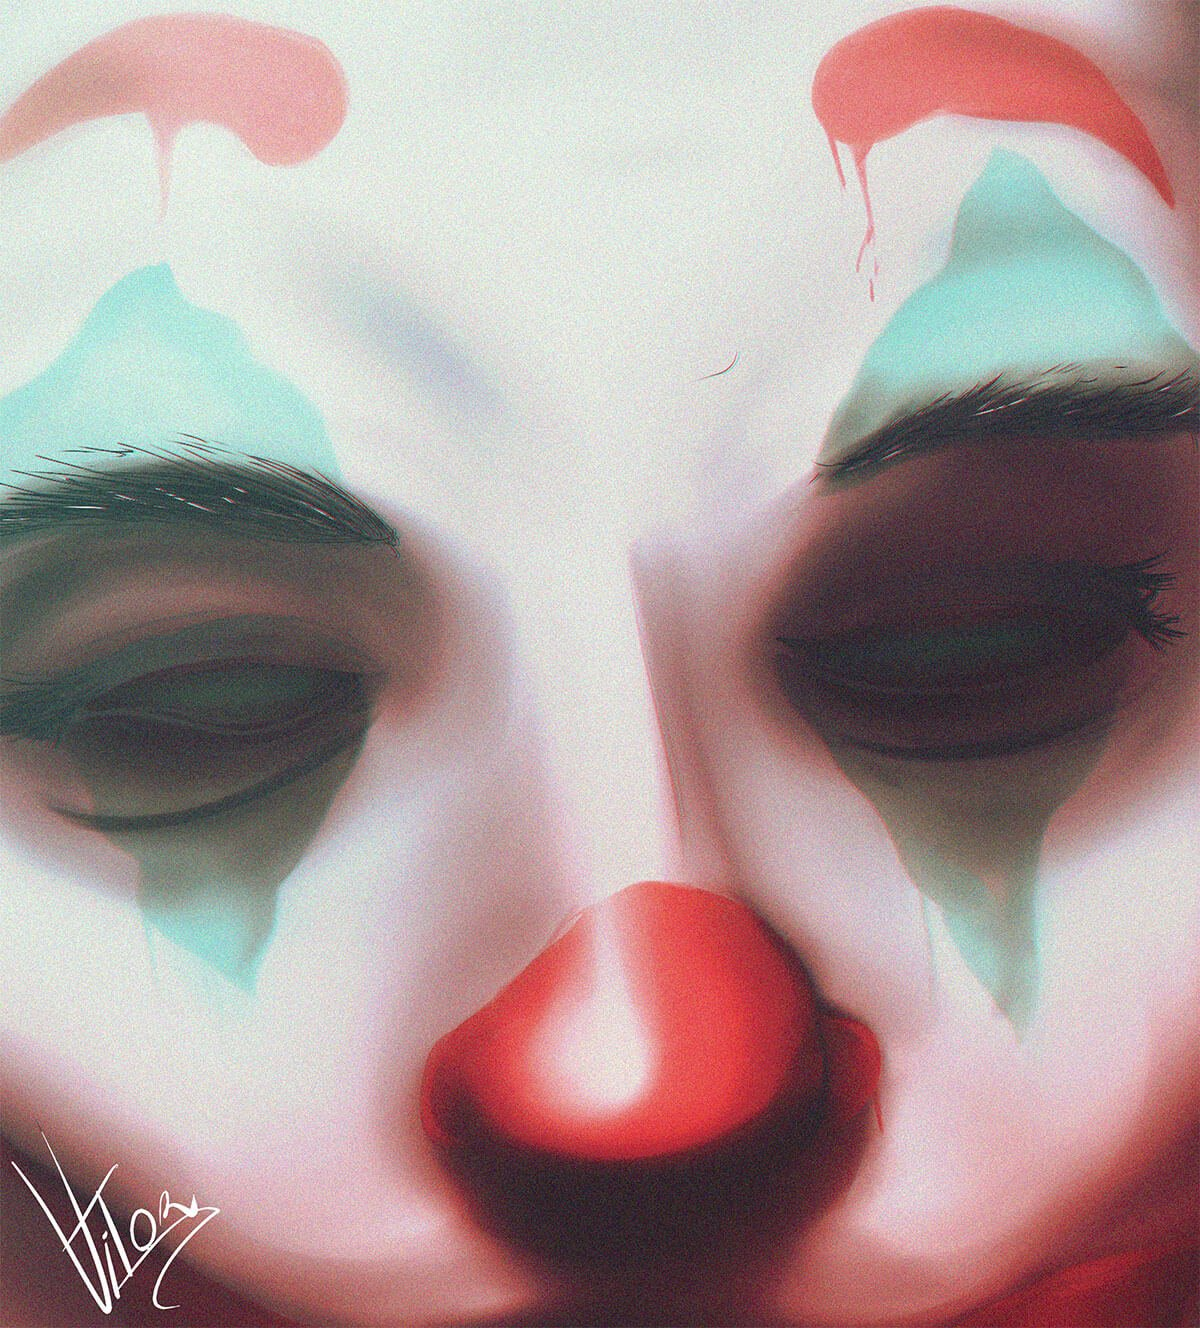 The Joker Art by Vitor Cachoeira